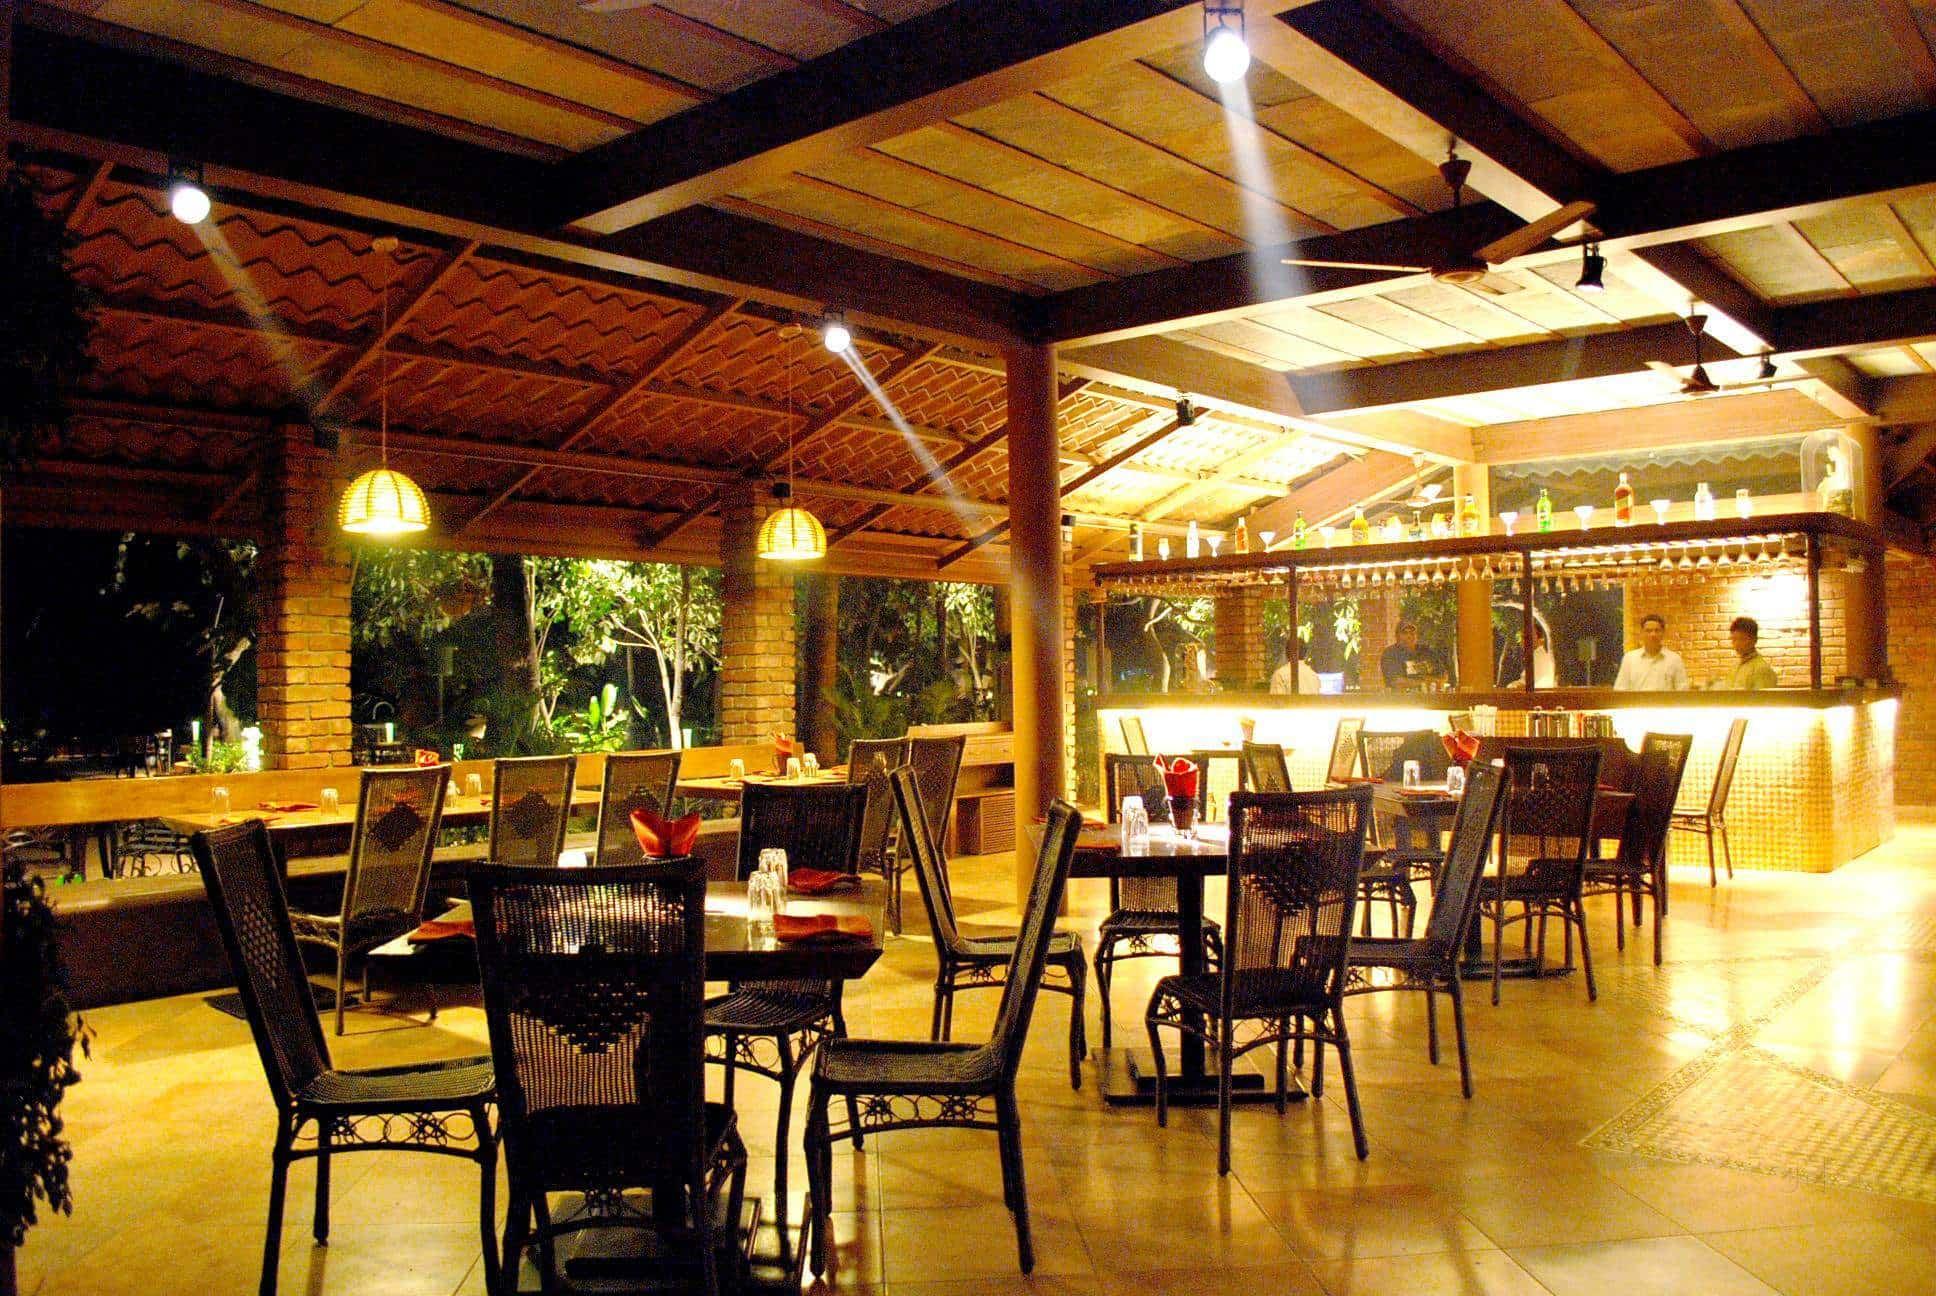 Sai Palace Hotel & Garden, Mira Village, Mumbai - North Indian ...